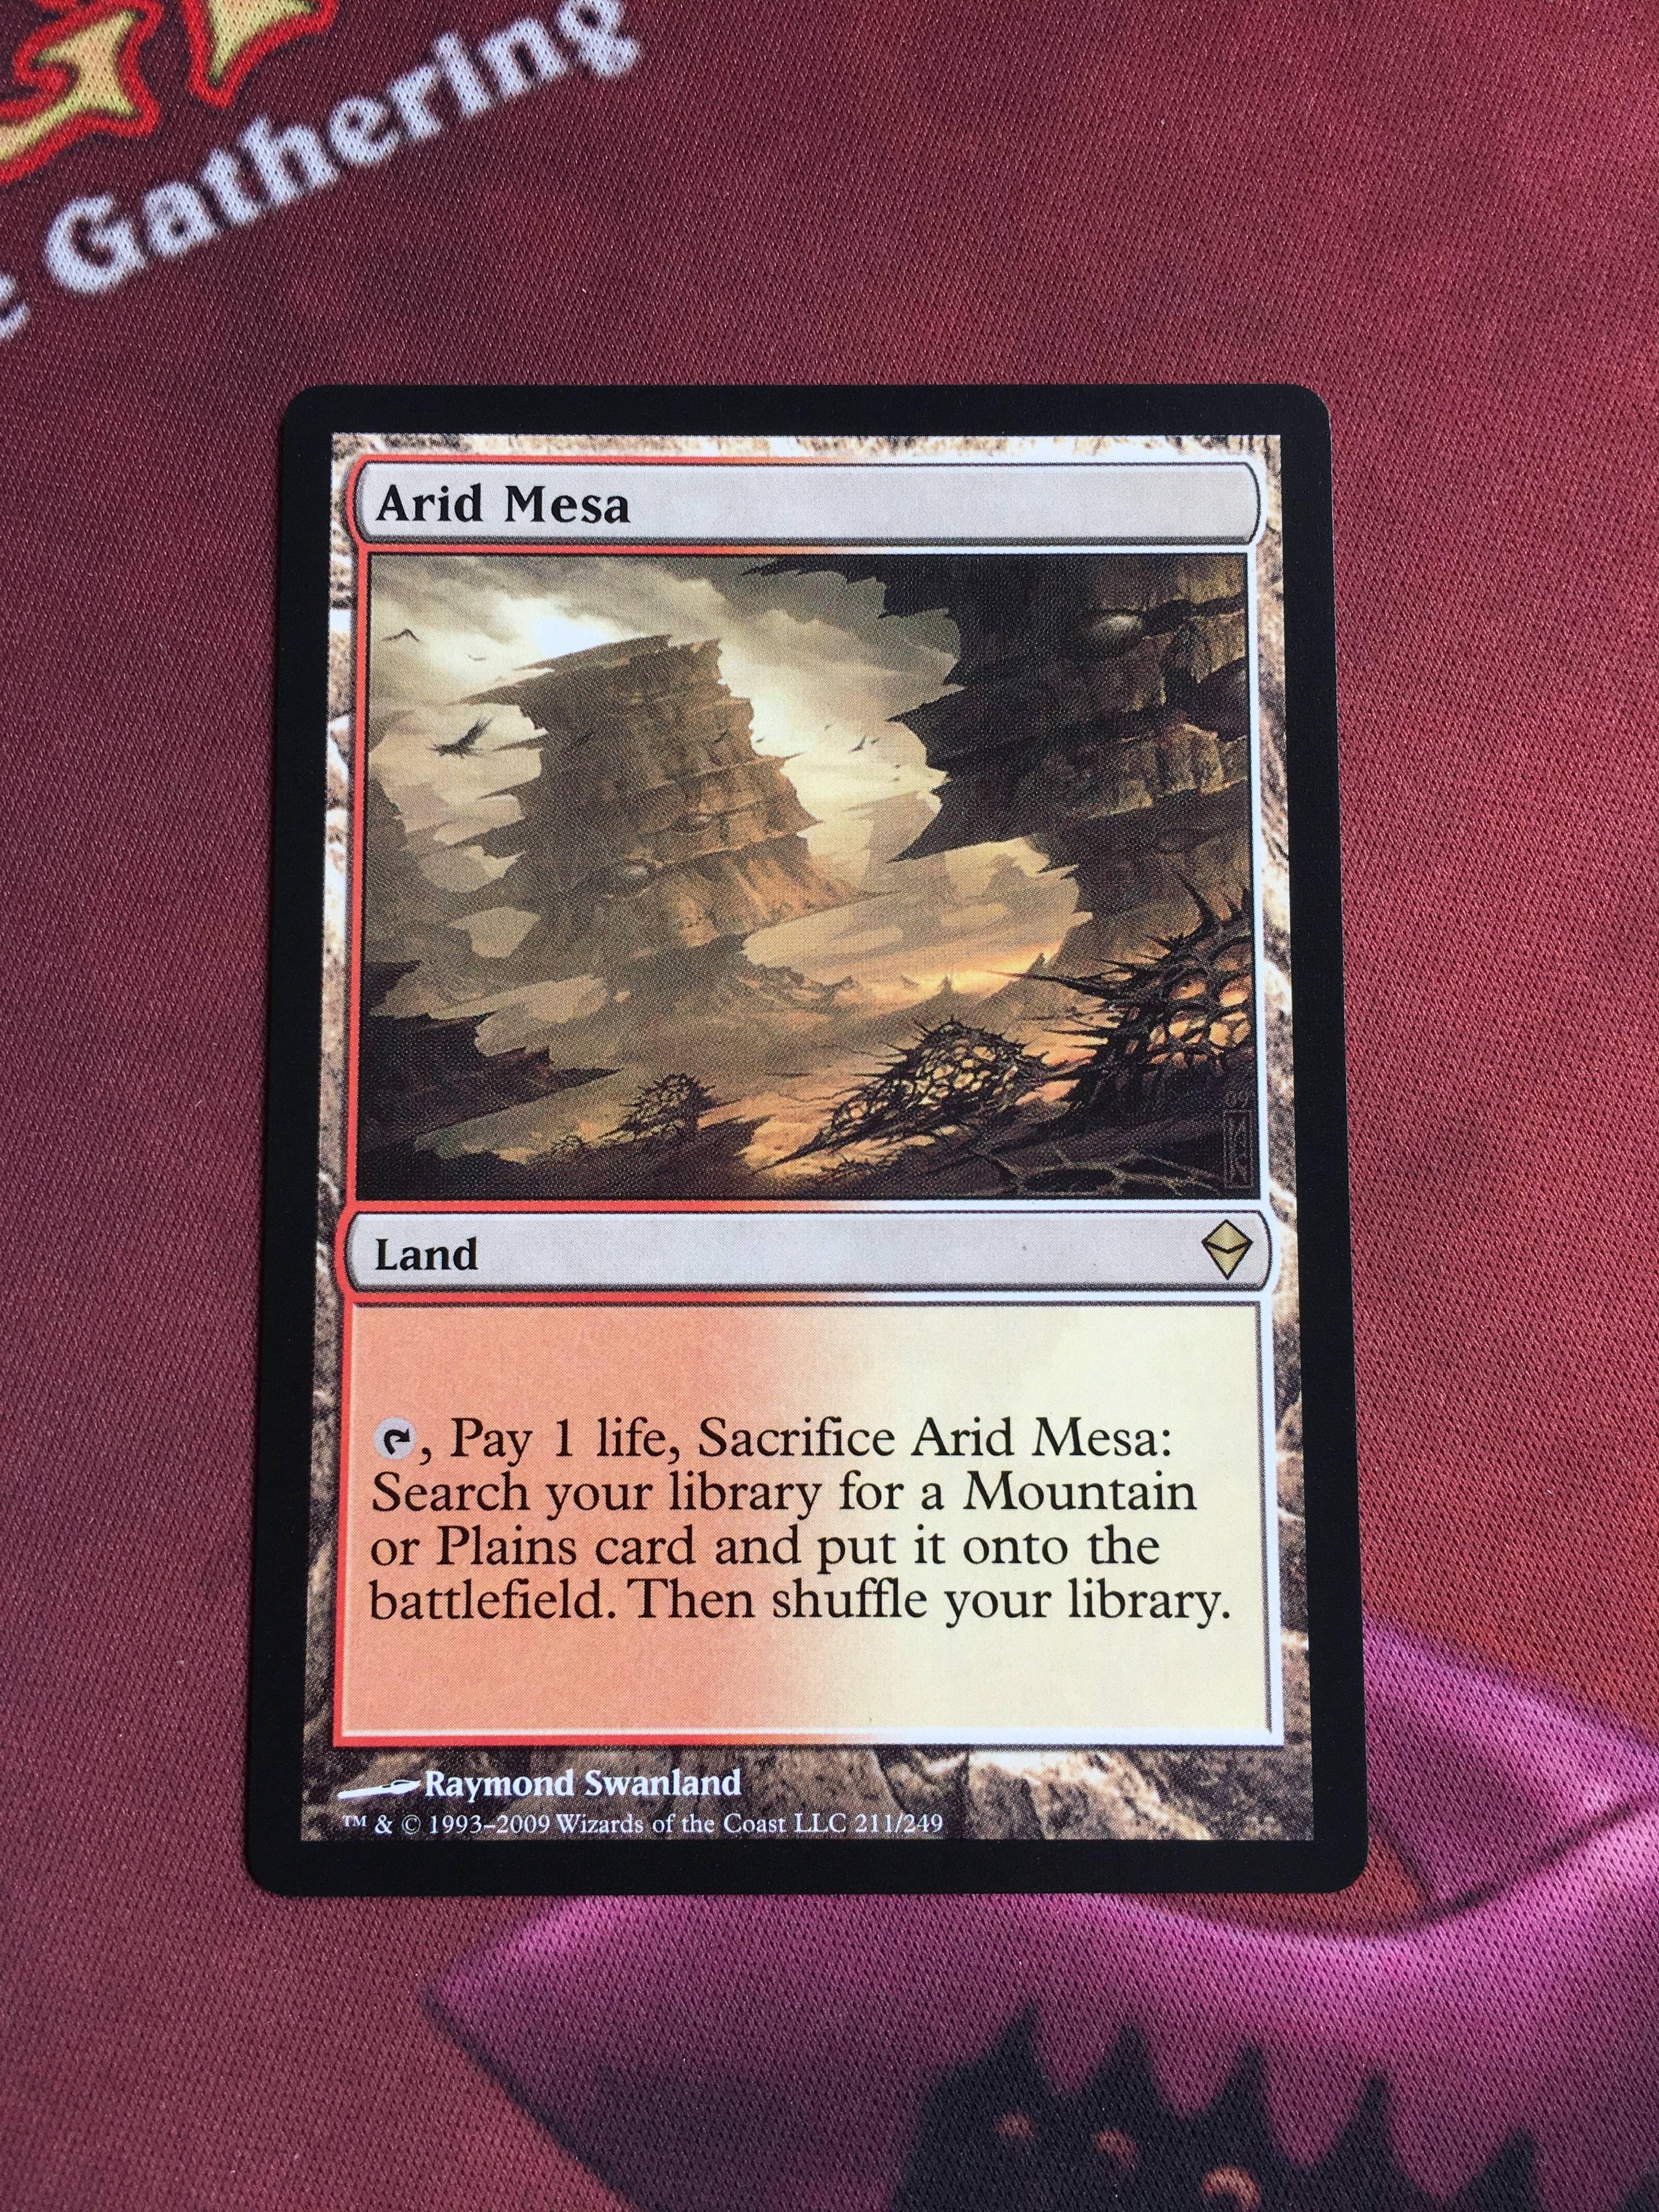 Arid Mesa Zendikar Magician ProxyKing 8.0 VIP The Proxy Cards To Gathering Every Single Mg Card.